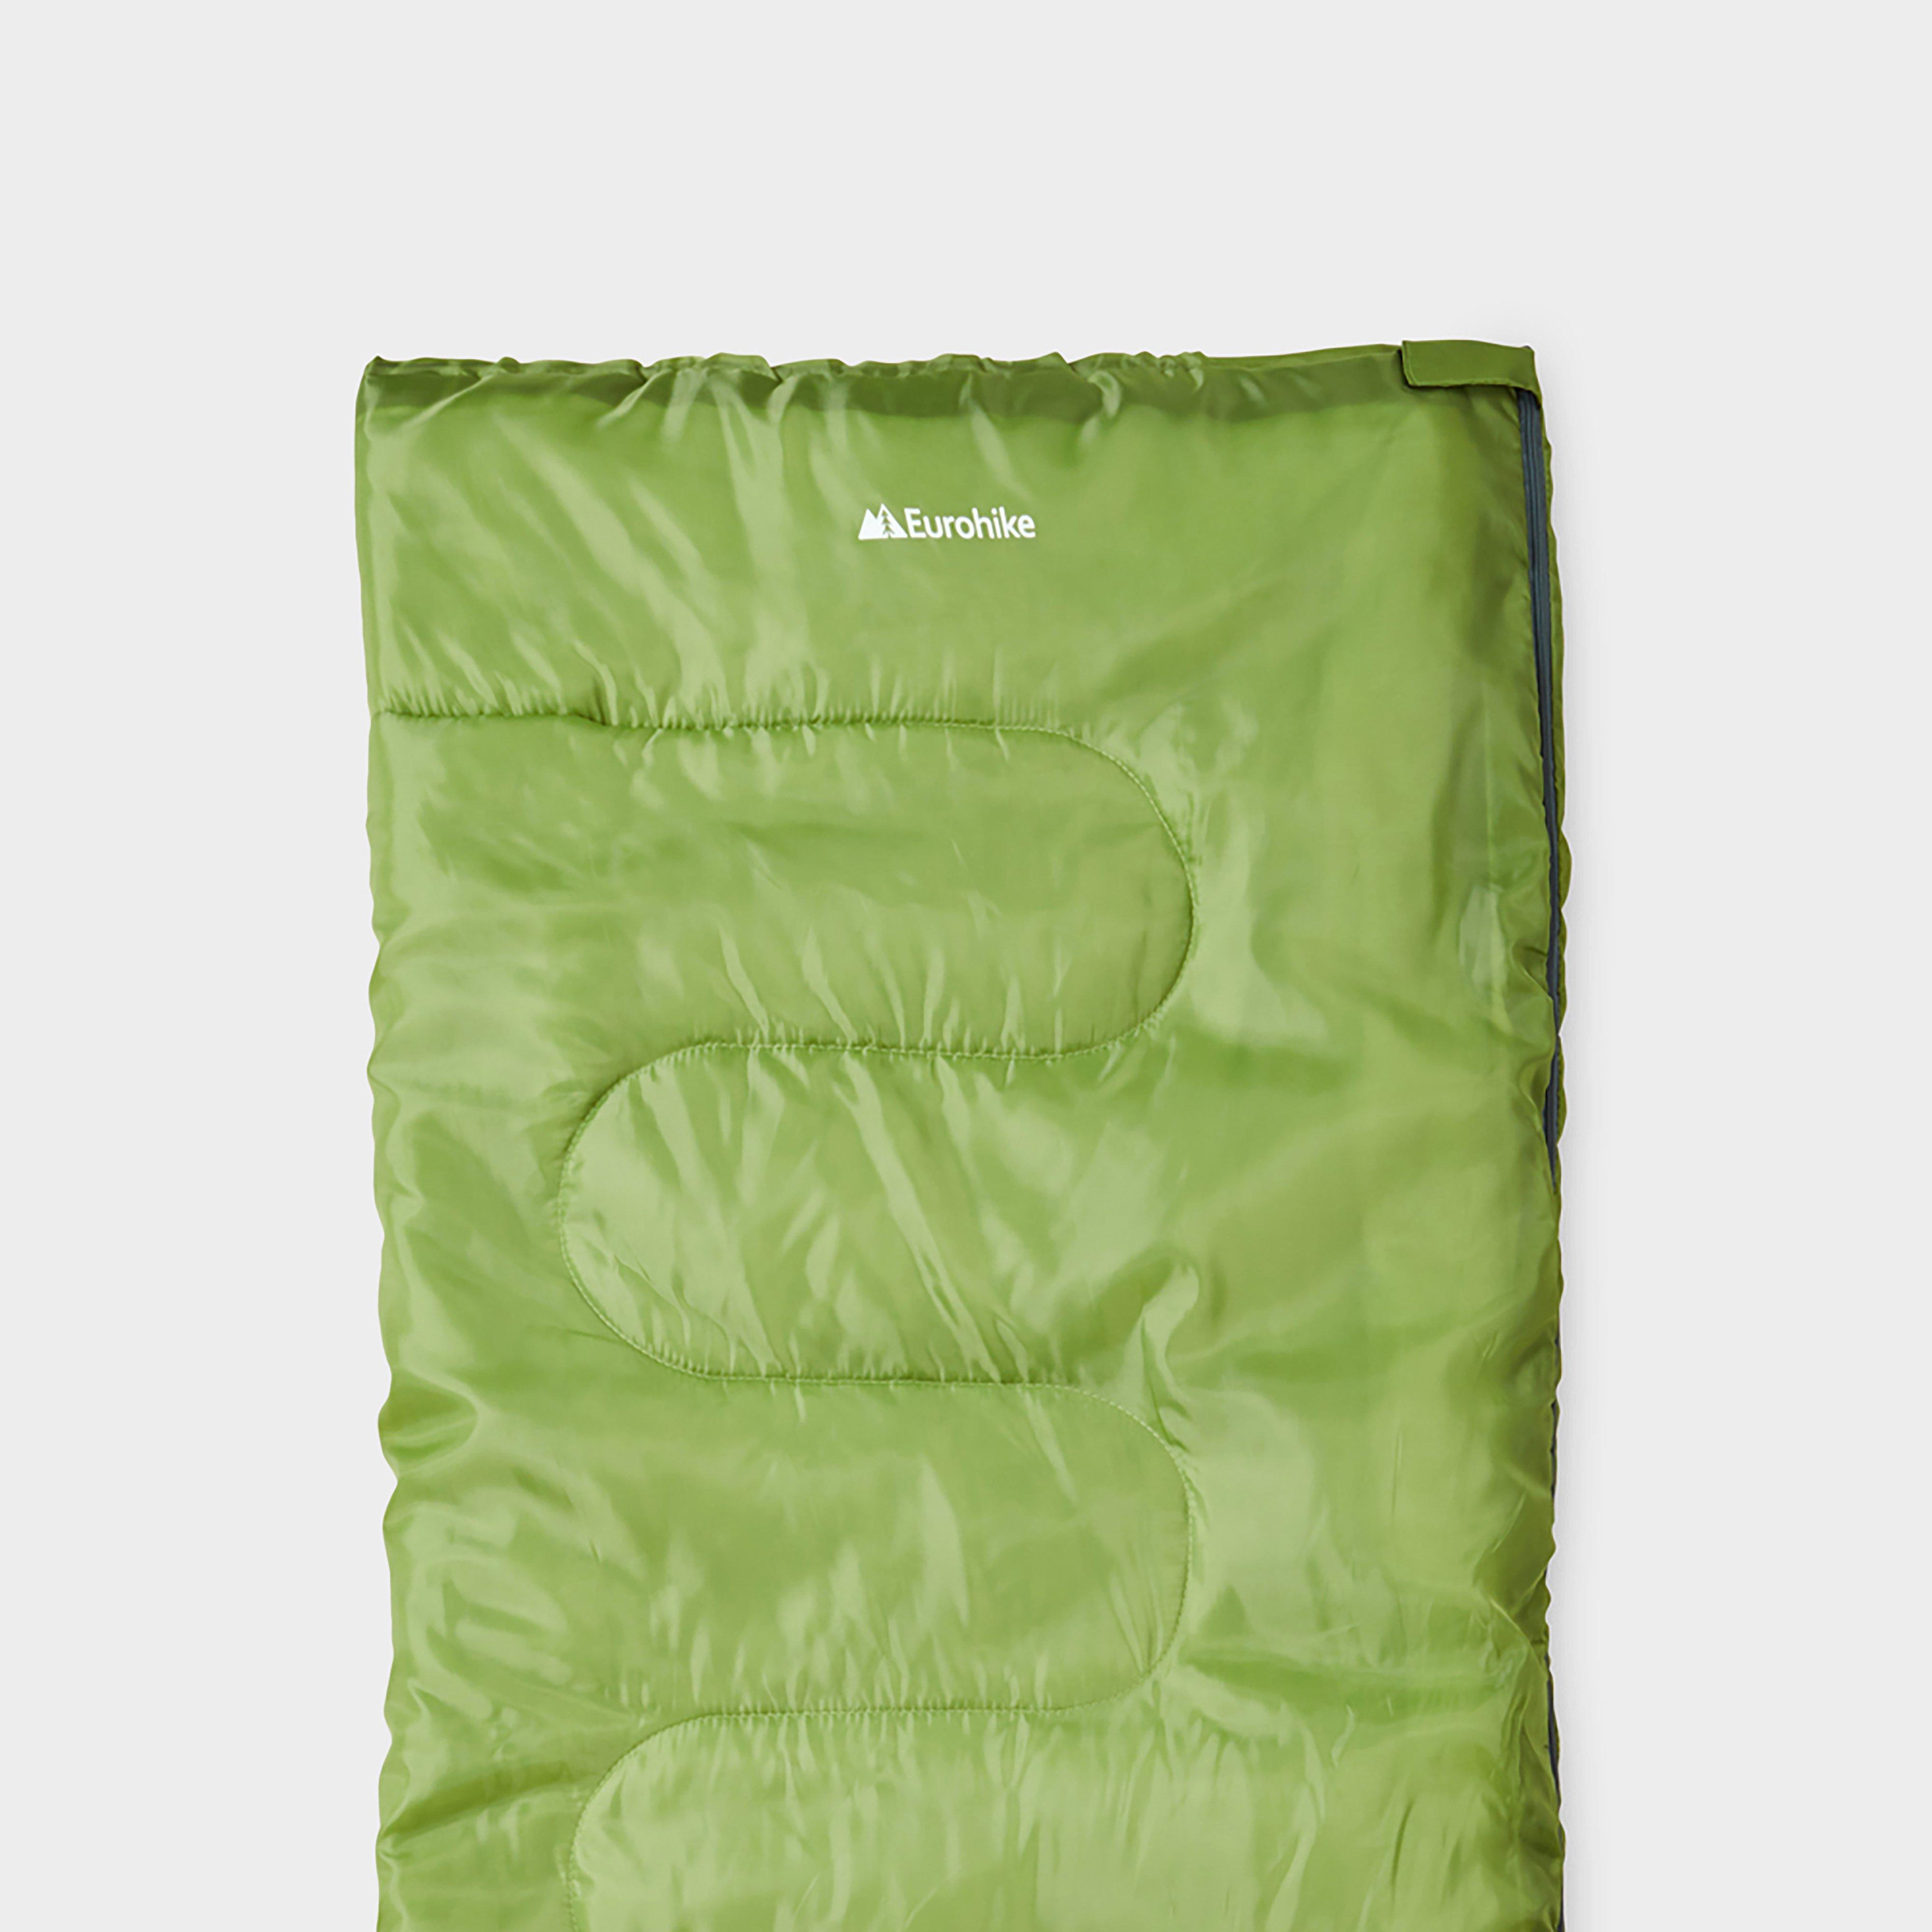 Eurohike Eurohike Snooze 250 Sleeping Bag - Green, Green